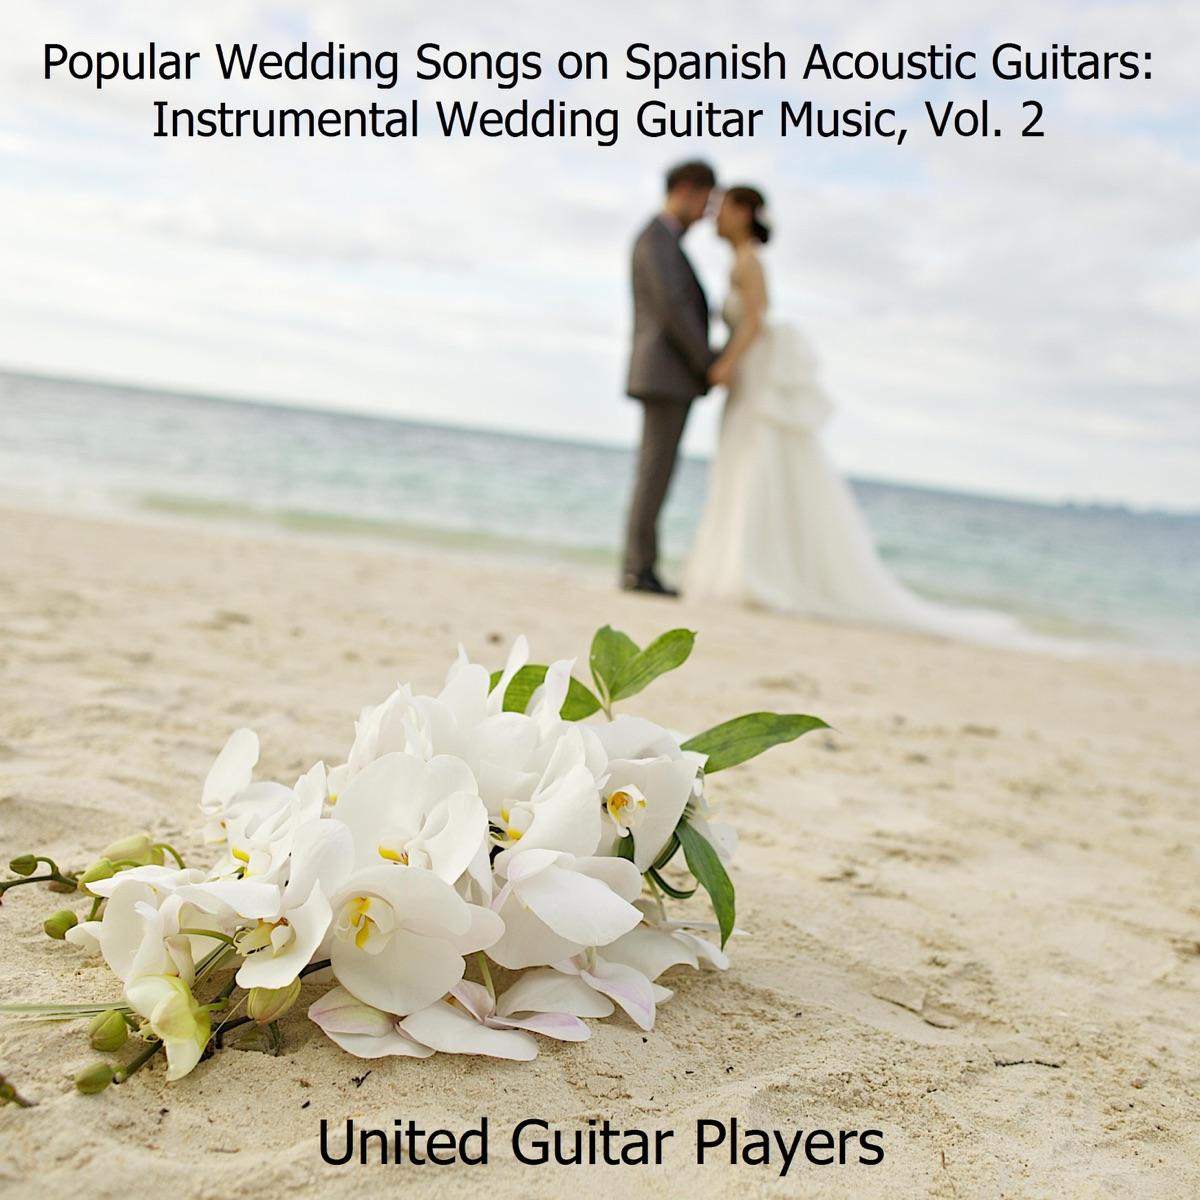 Popular Wedding Songs on Spanish Acoustic Guitars